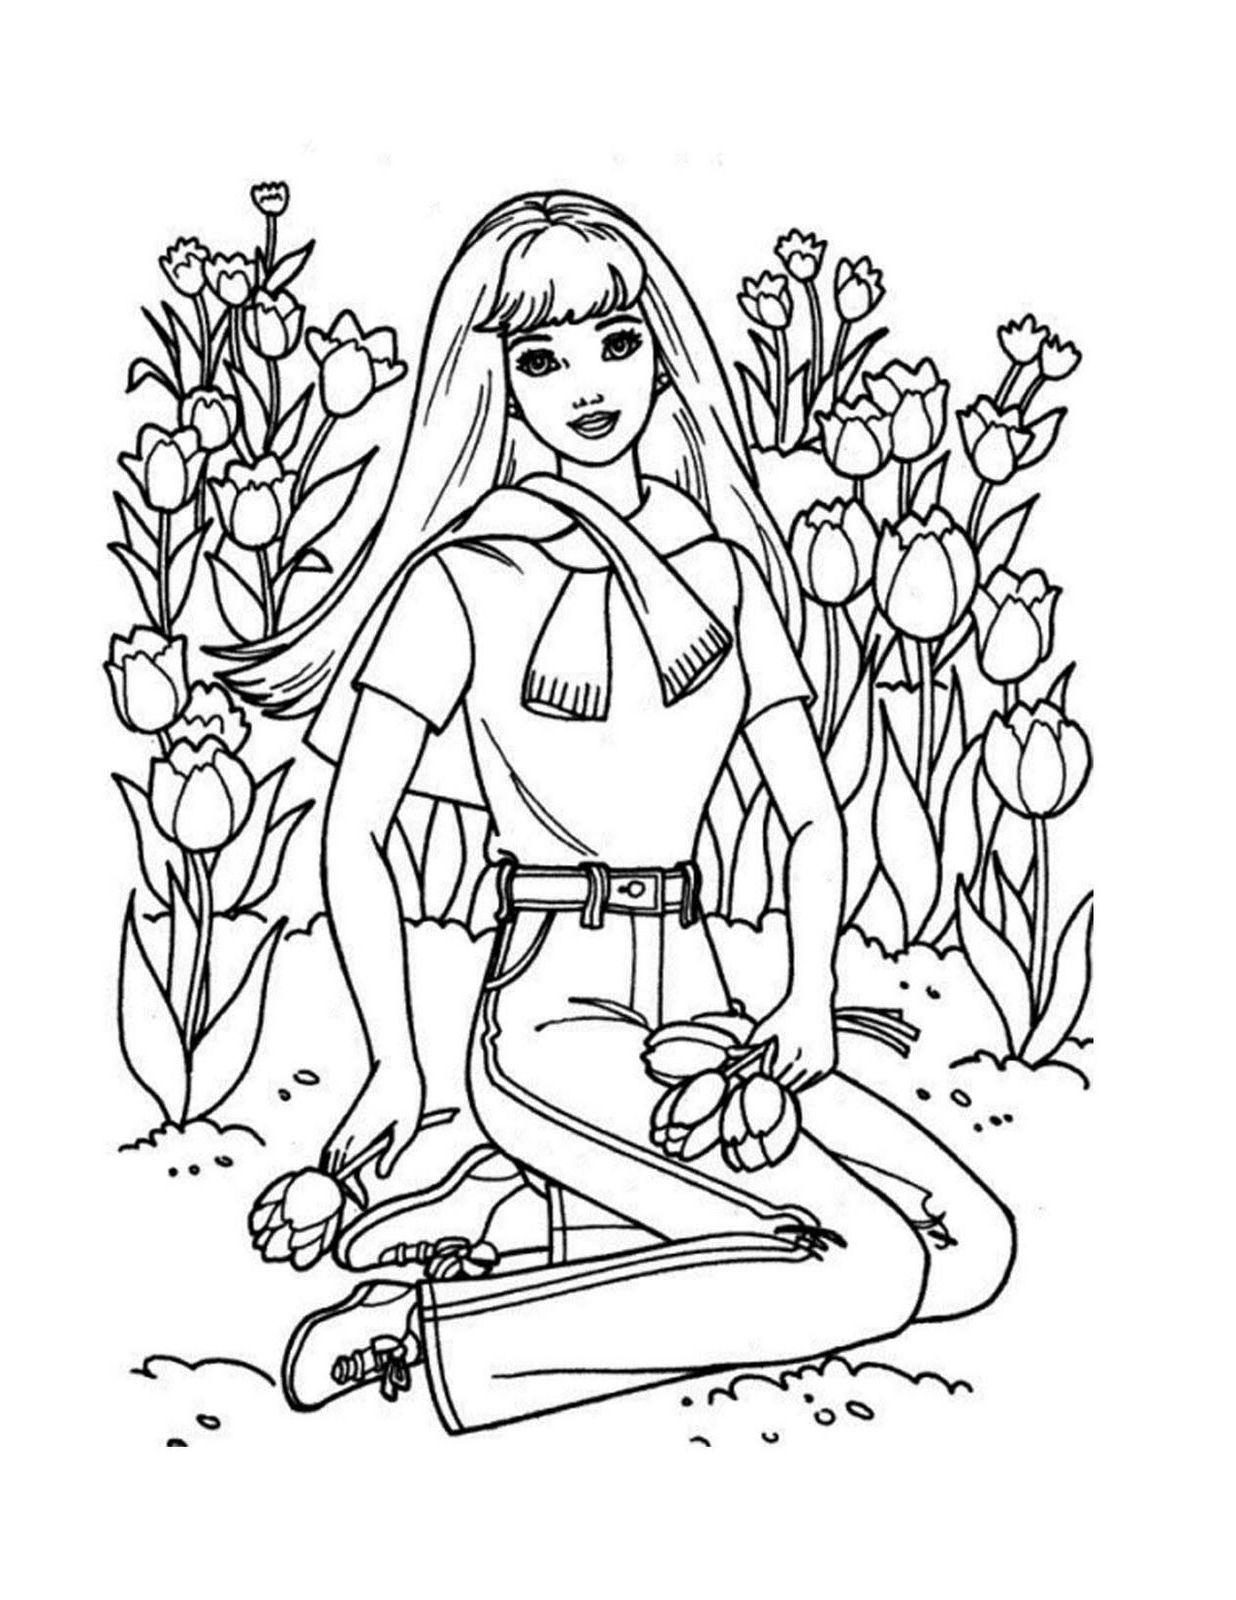 Coloring page Princess Barbie Disney Princess Coloring